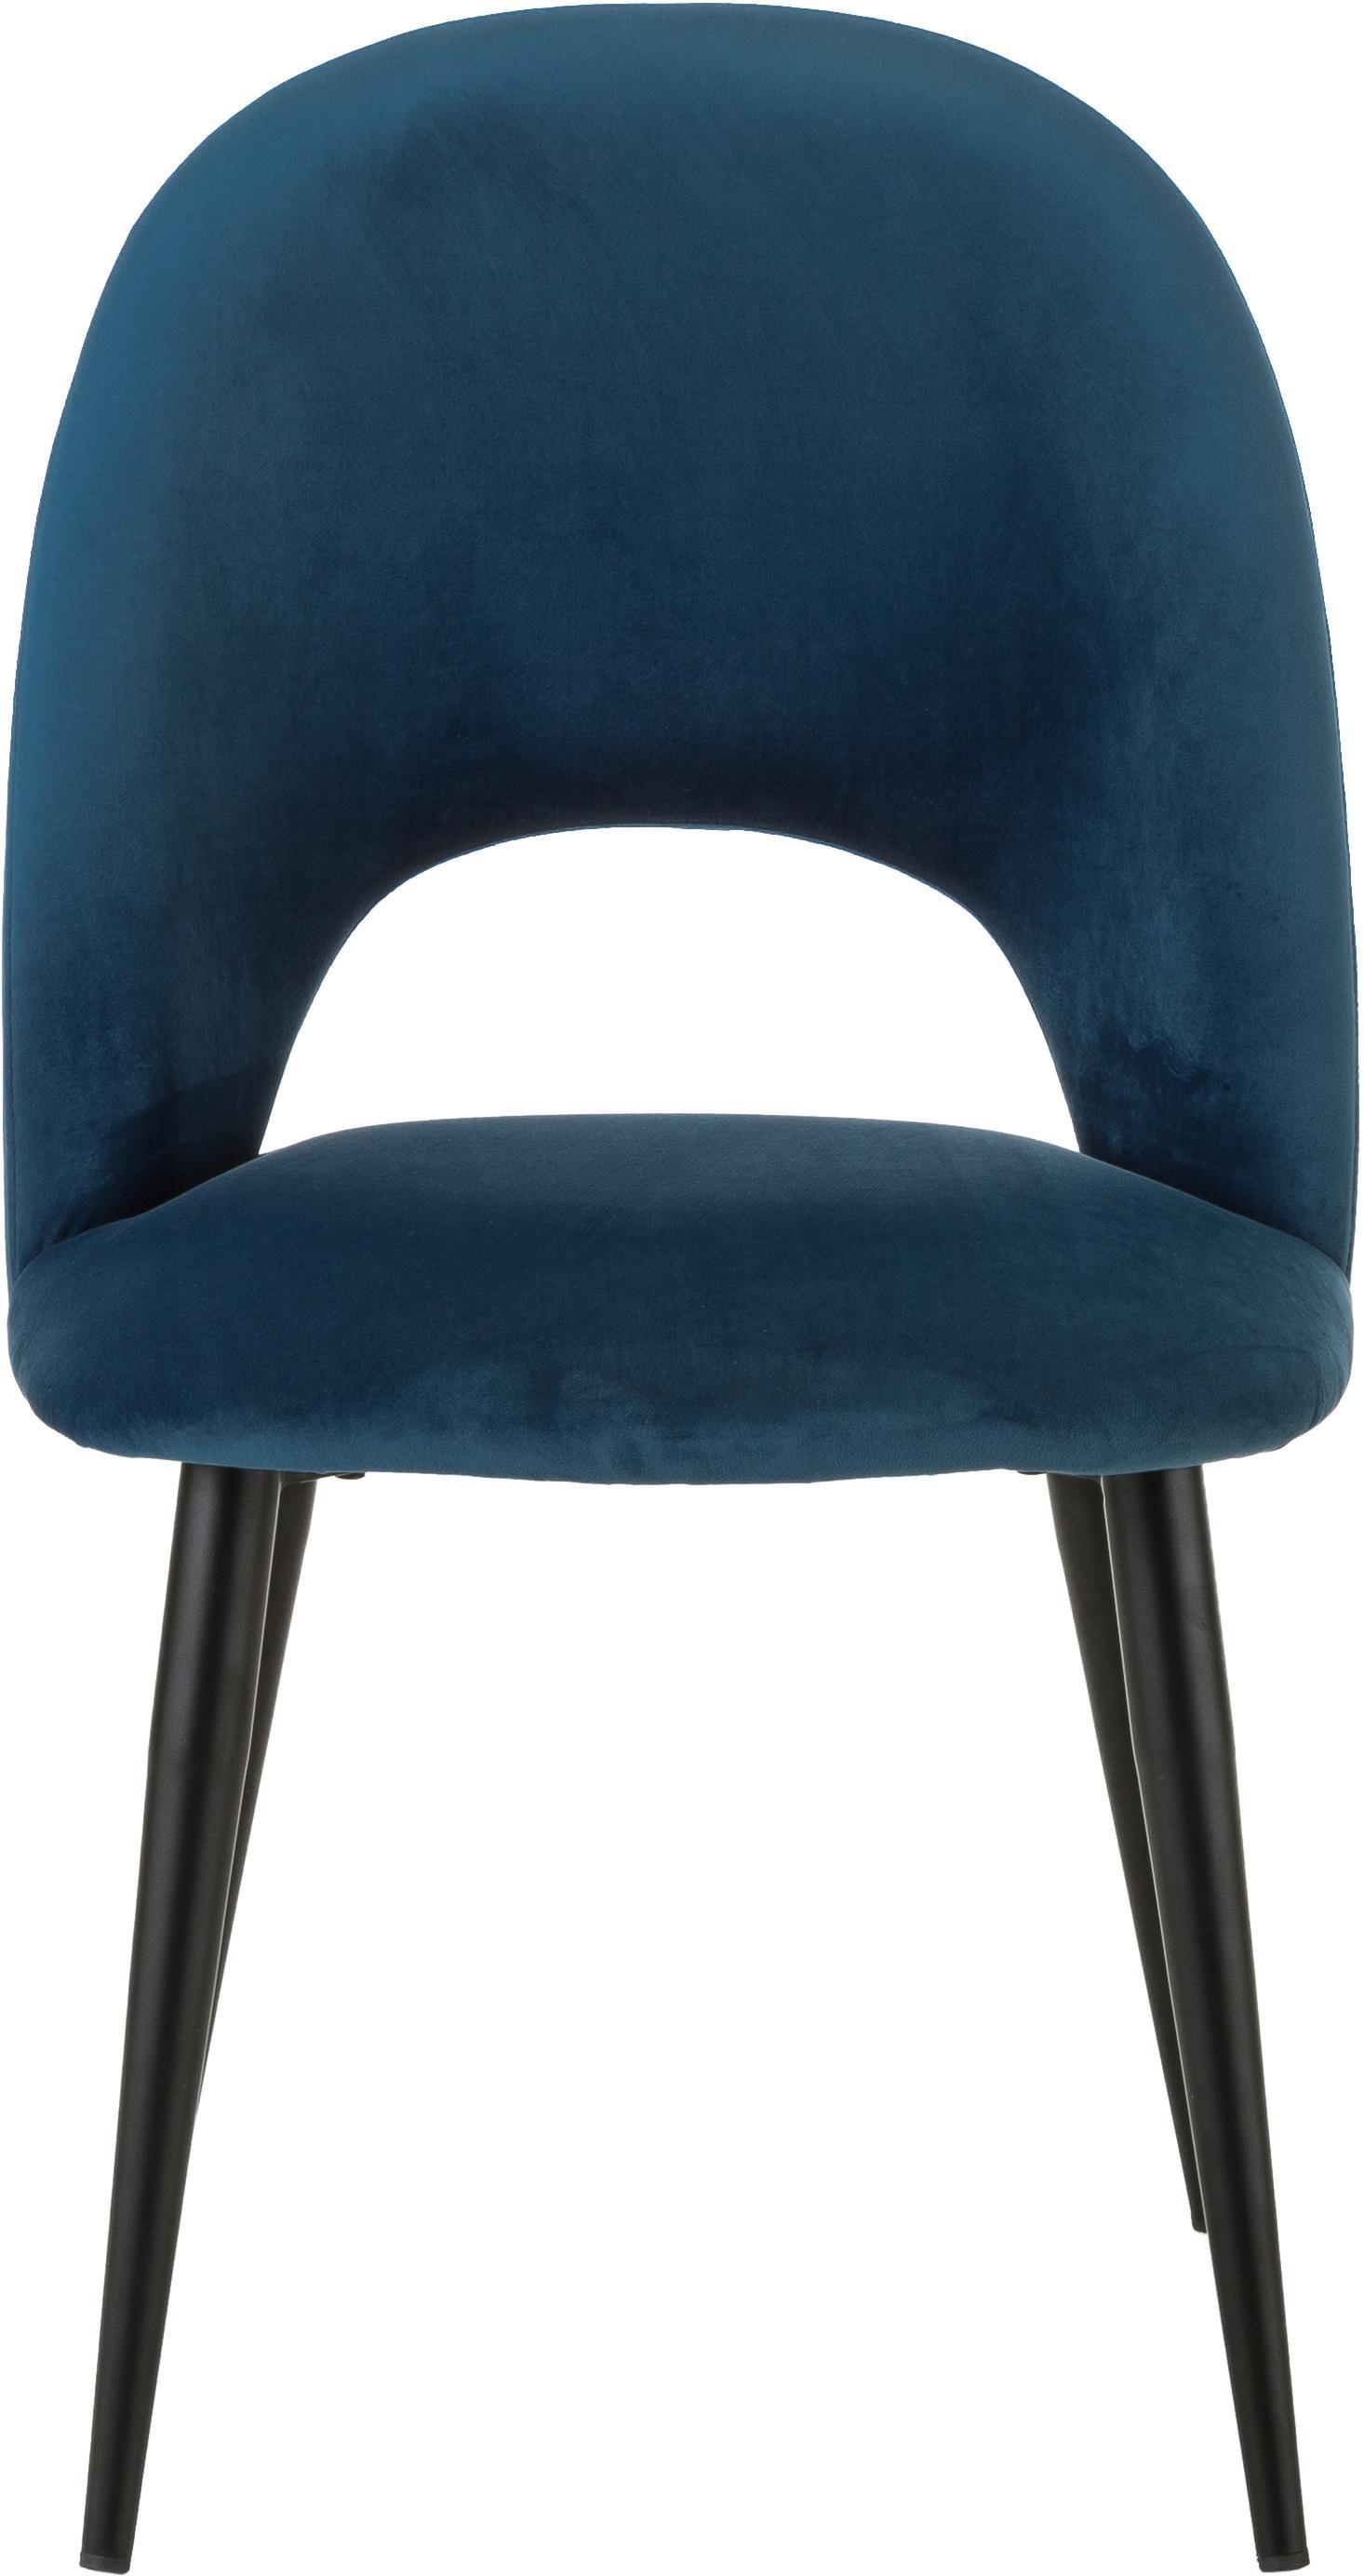 Sedia imbottita in velluto Rachel, Rivestimento: velluto (rivestimento in , Gambe: metallo verniciato a polv, Blu scuro, Larg. 53 x Prof. 57 cm